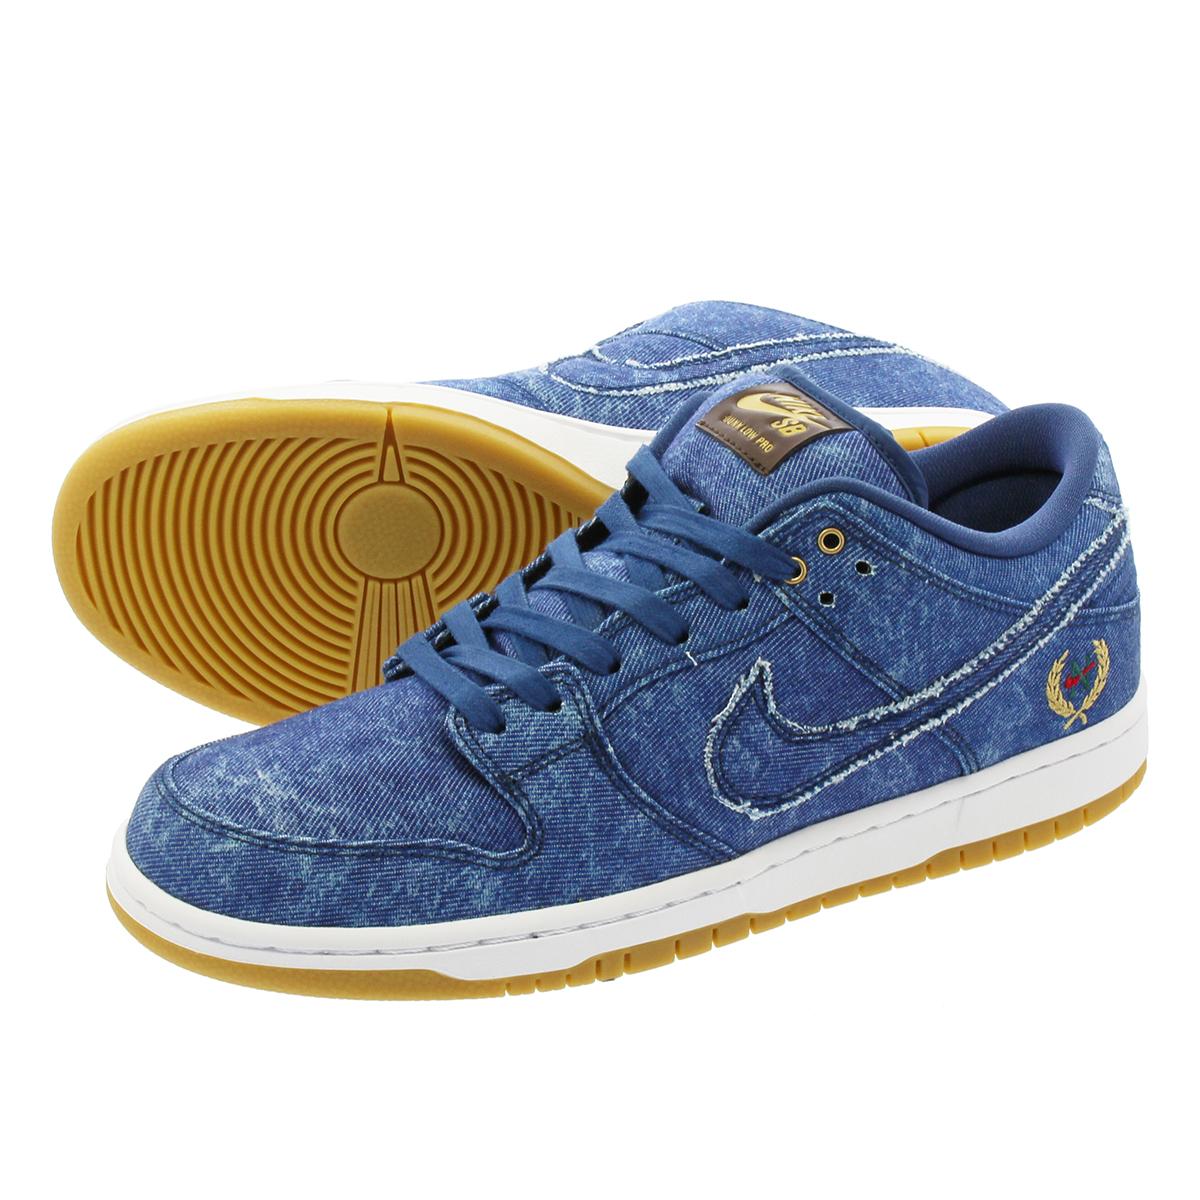 online retailer 5d0ff 030ea NIKE SB DUNK LOW TRD QS Nike SB dunk low TRD QS UTILITY BLUE/WHITE/GUM  LIGHT BROWN